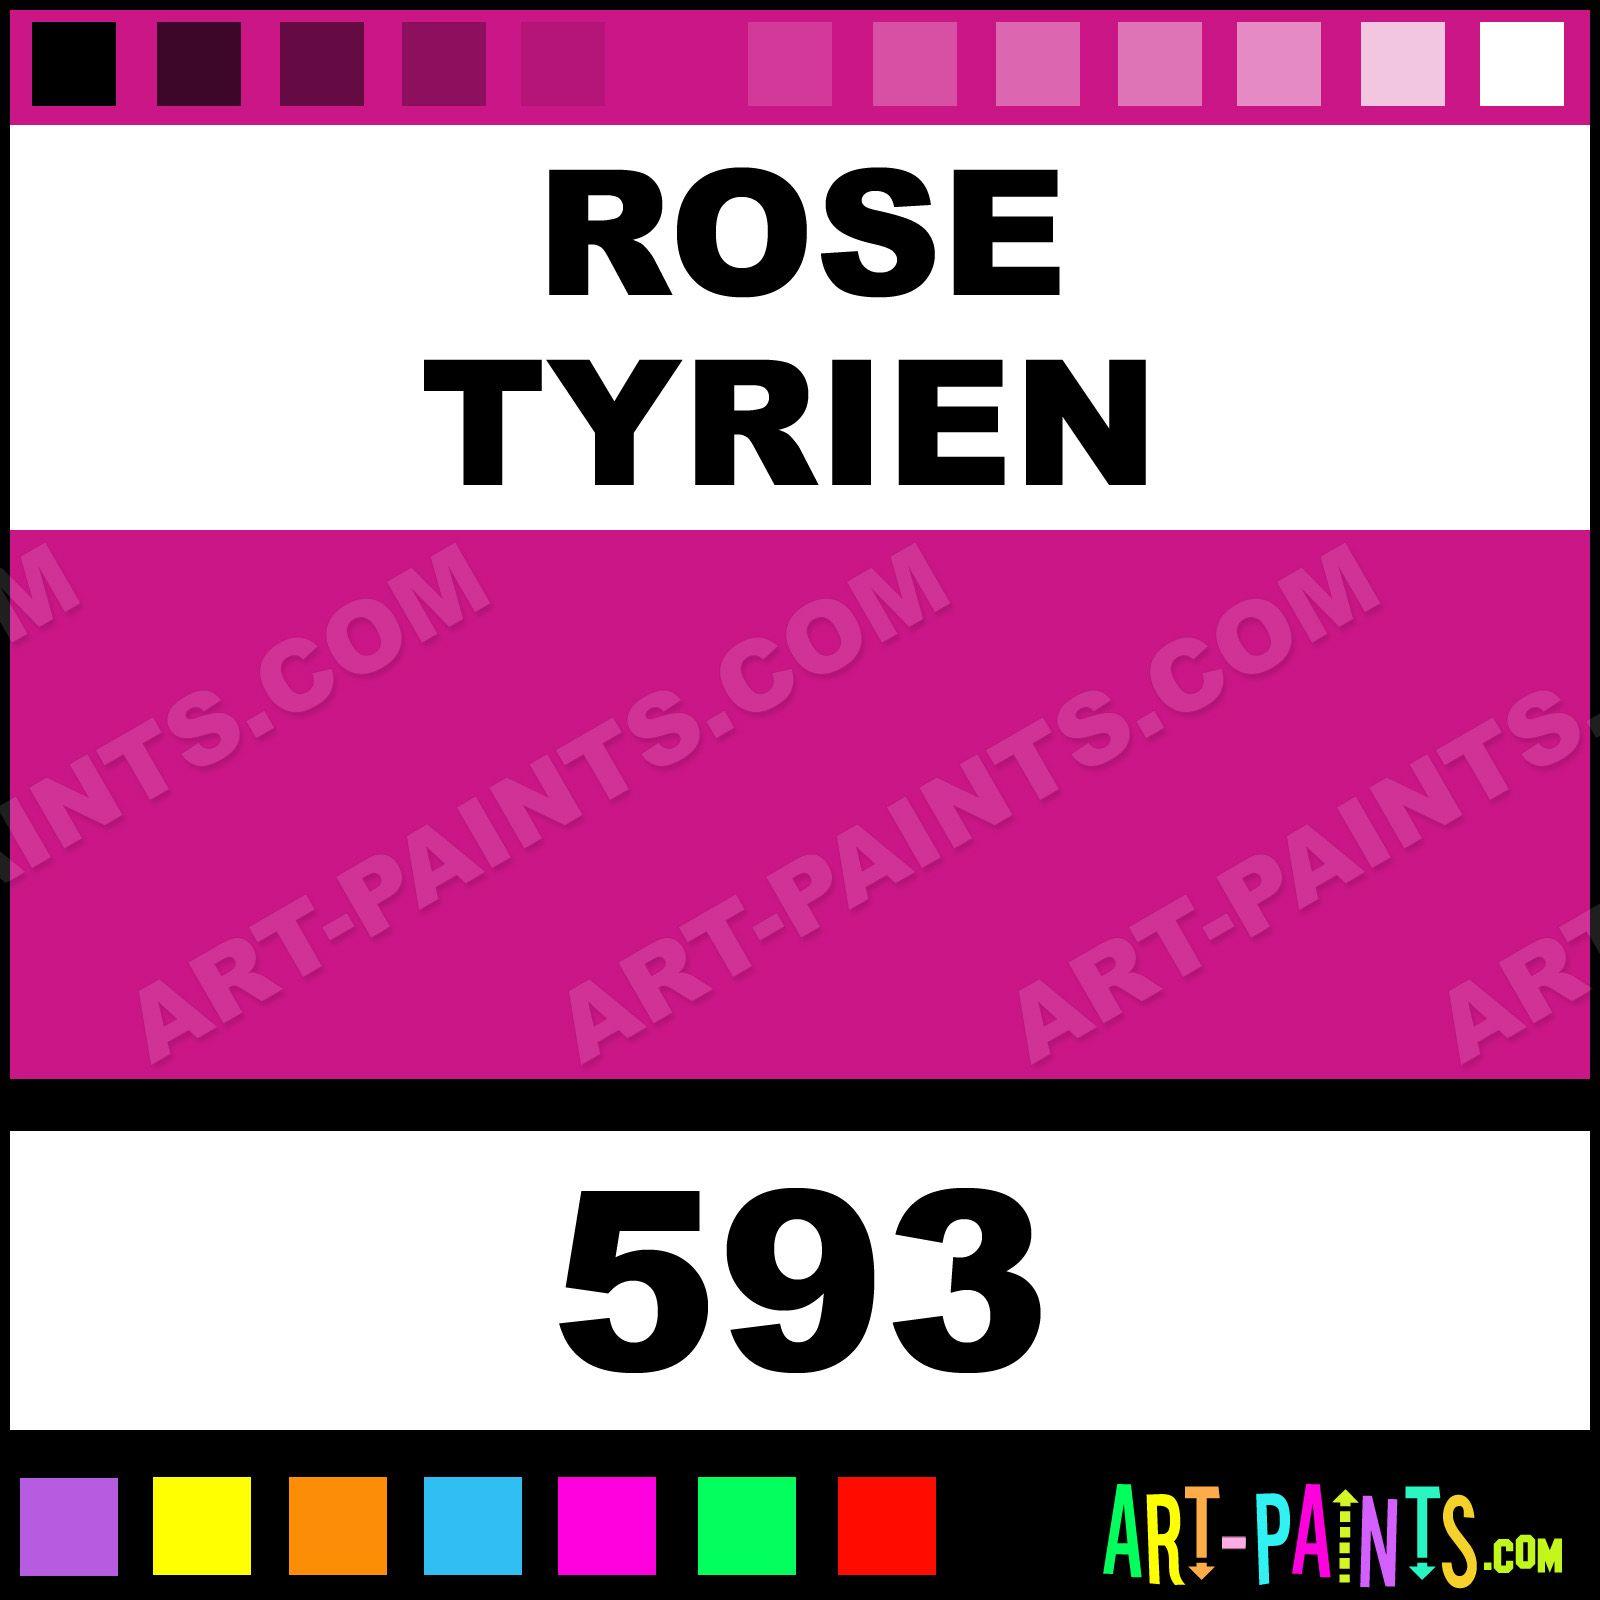 Rose tyrien rose indien fuschia magenta tyrien pinterest rose tyrien color chartsmagentagouachecolour nvjuhfo Image collections